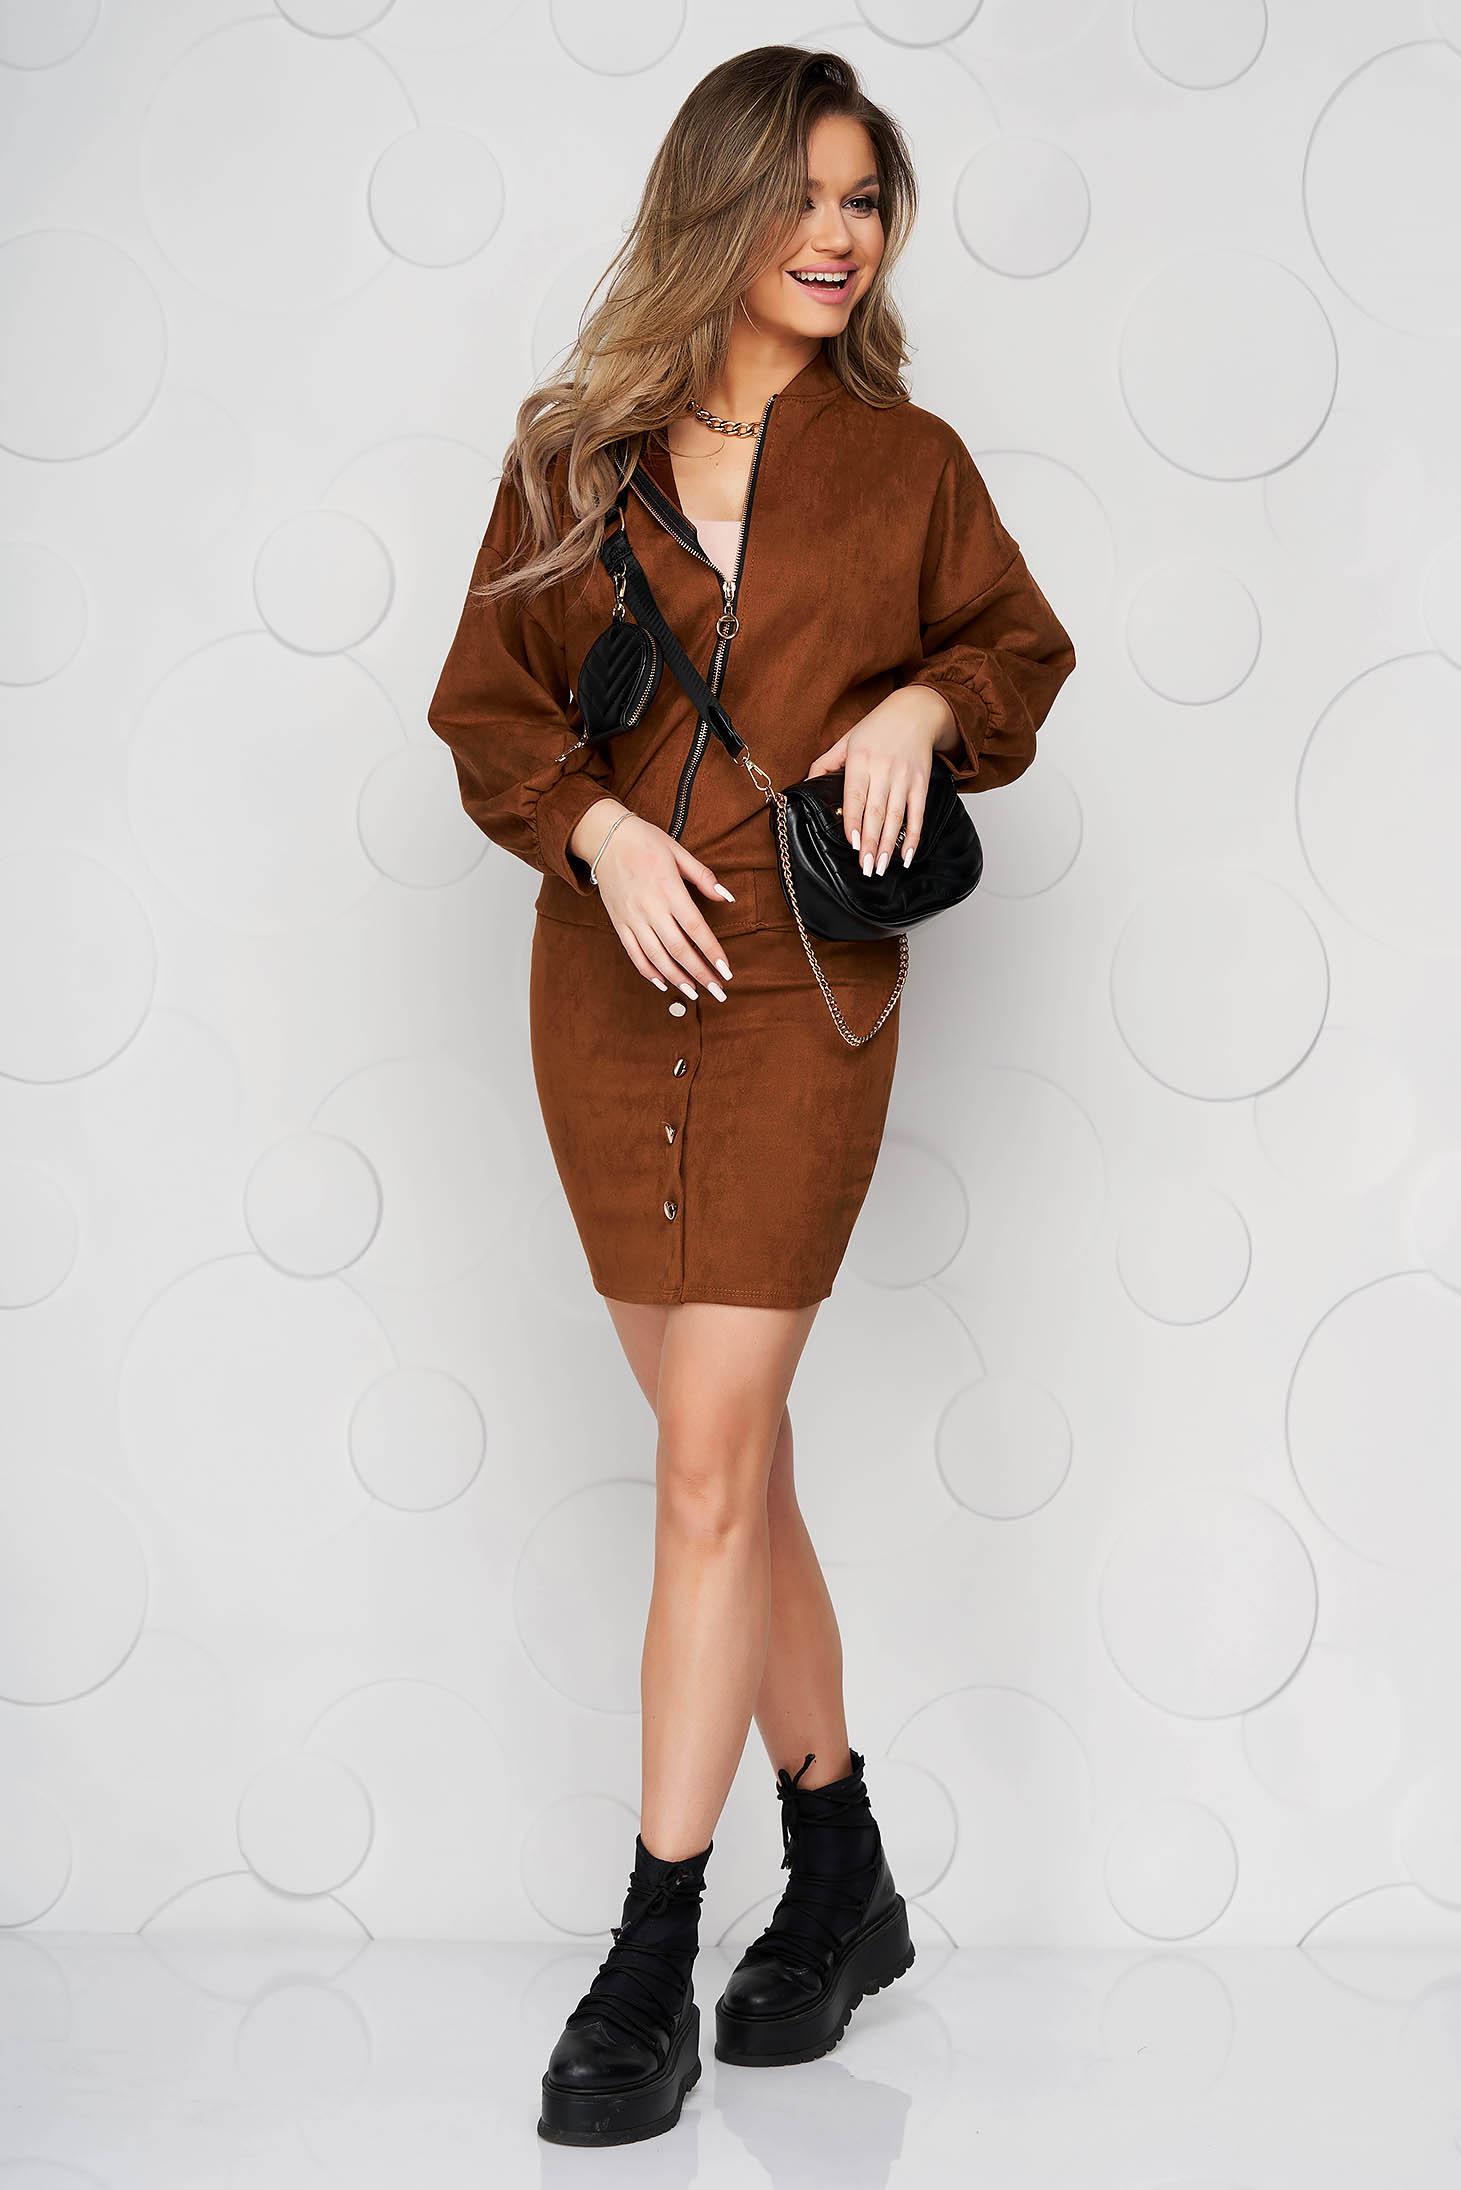 Brown skirt casual short cut medium waist elastic waist with button accessories